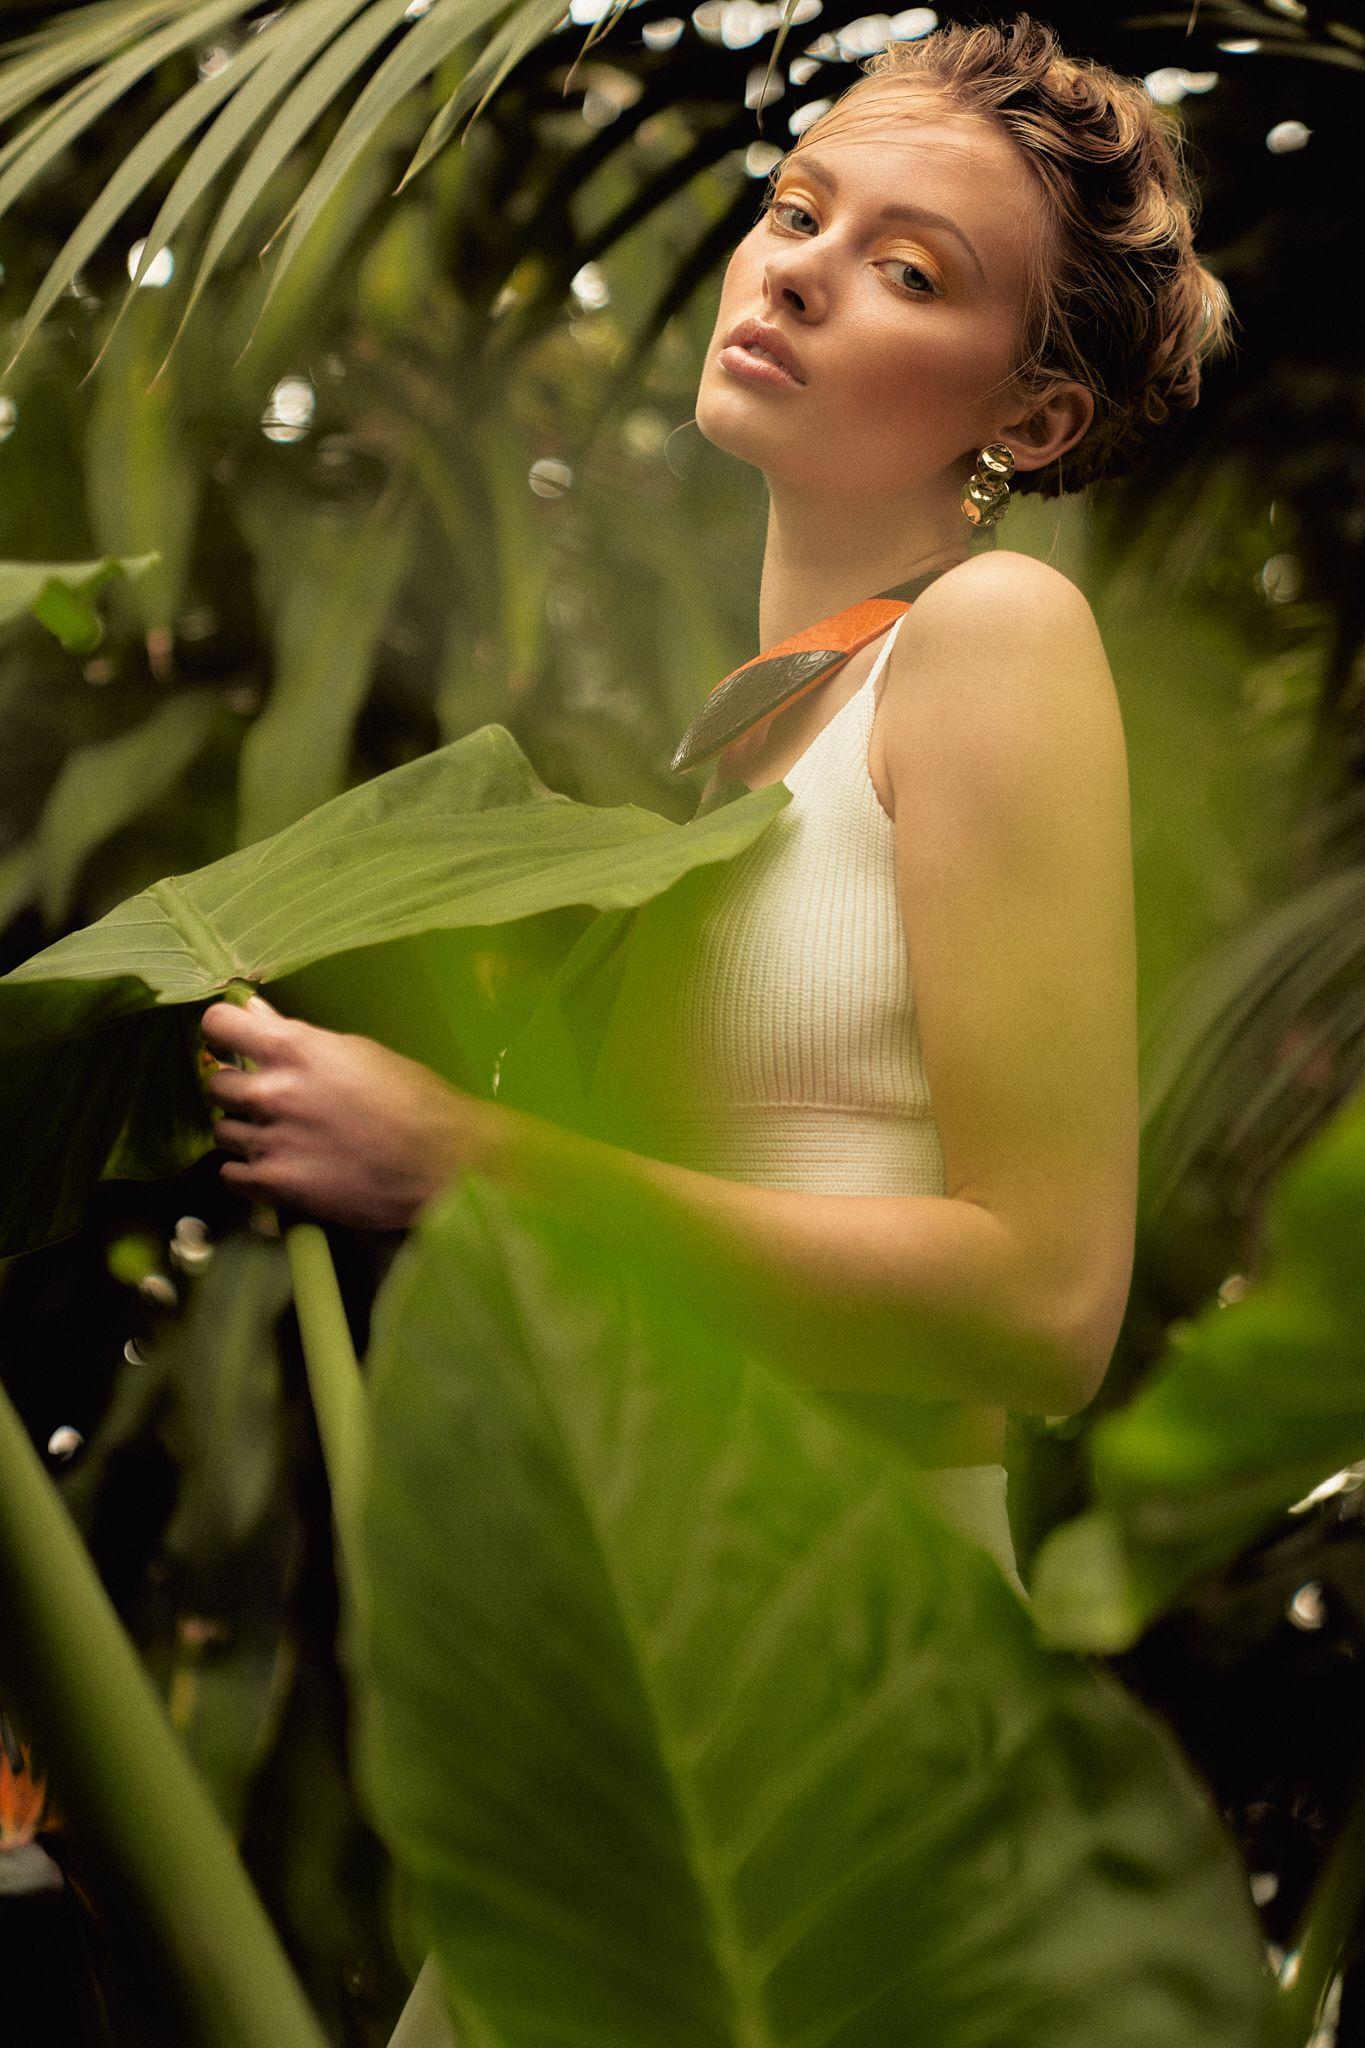 Garden of Eden -  Solstice Magazine UK - Outtakes - Pic. 6